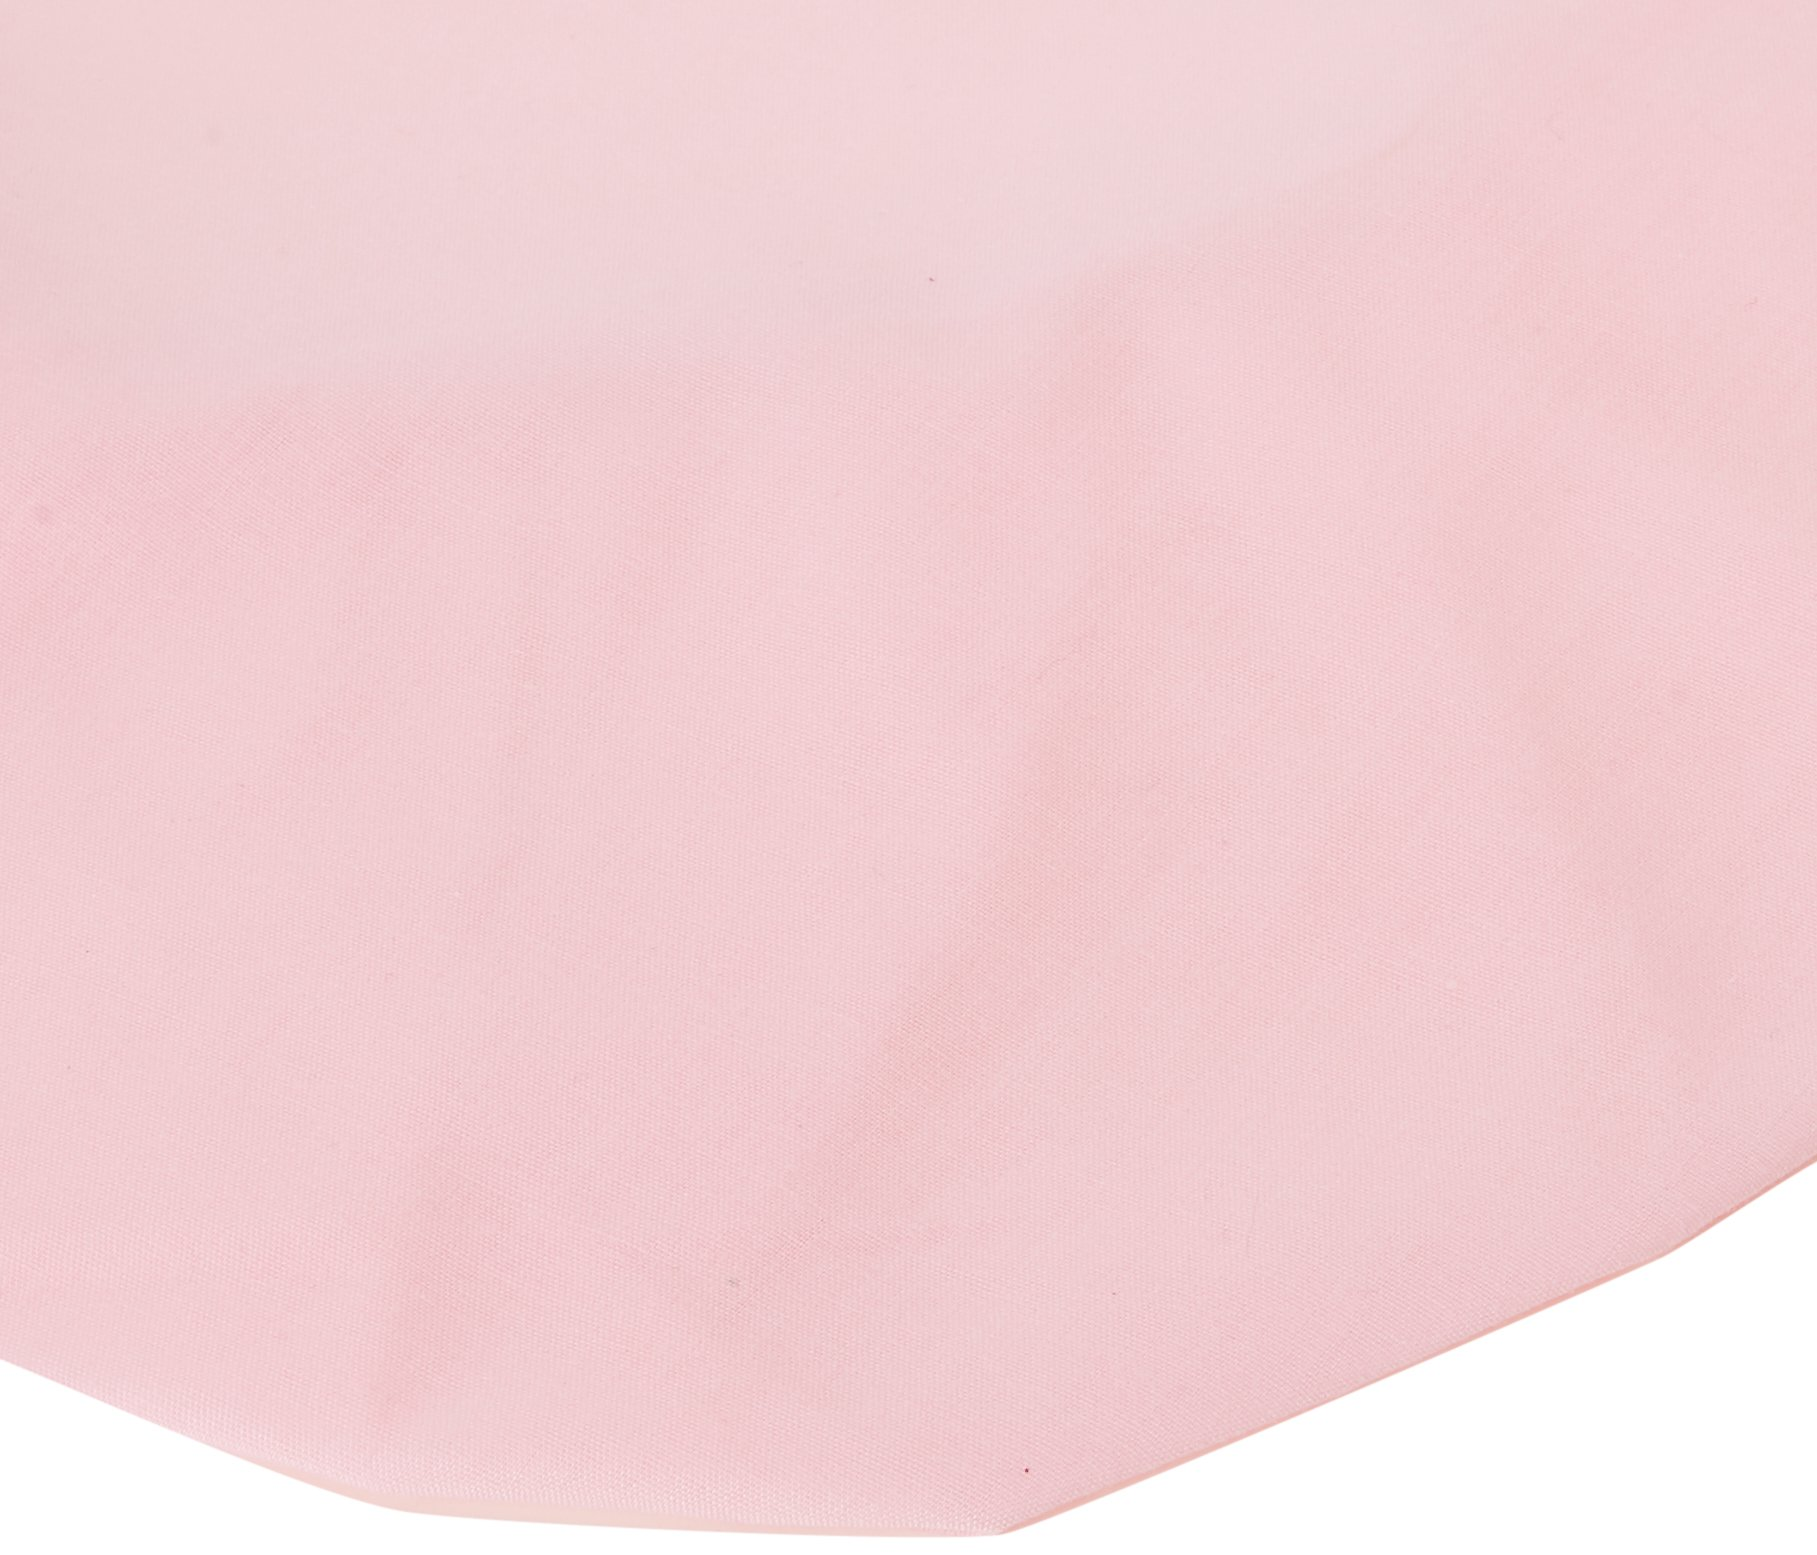 Babydoll Bedding Poly Cotton Bassinet Sheet, Pink, 13'' x 29''